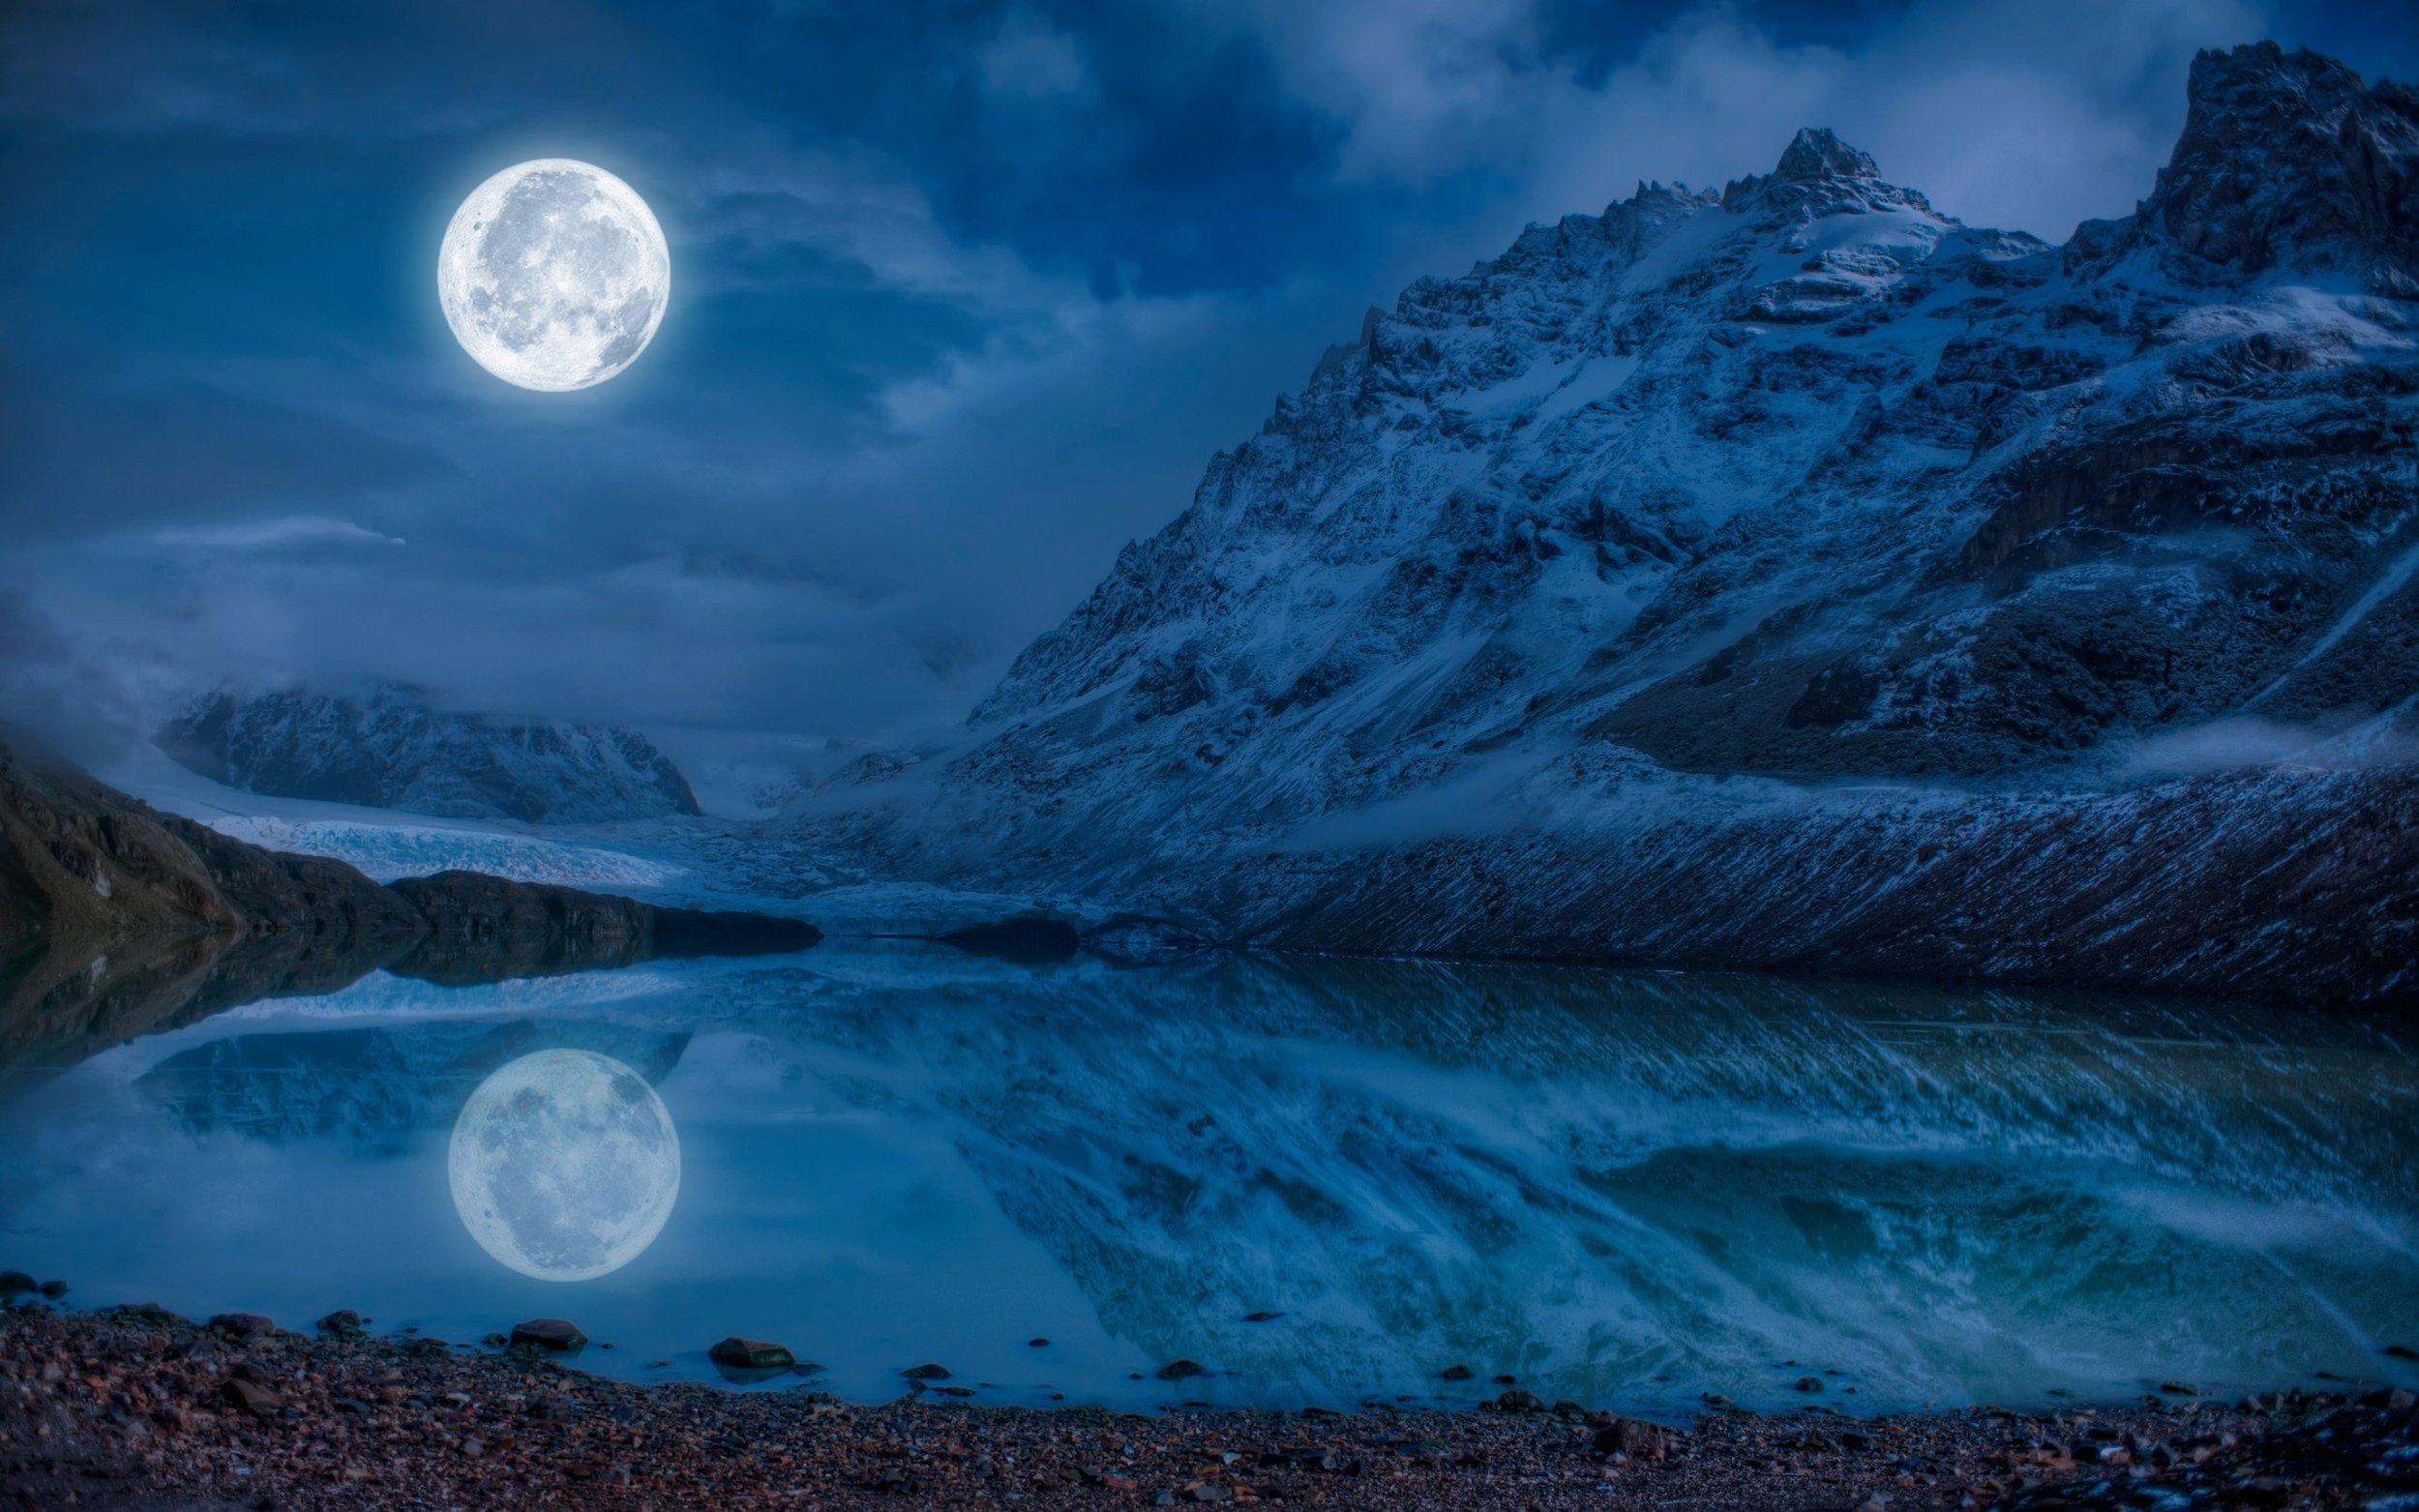 water-mountain-moon-river-158056.jpeg